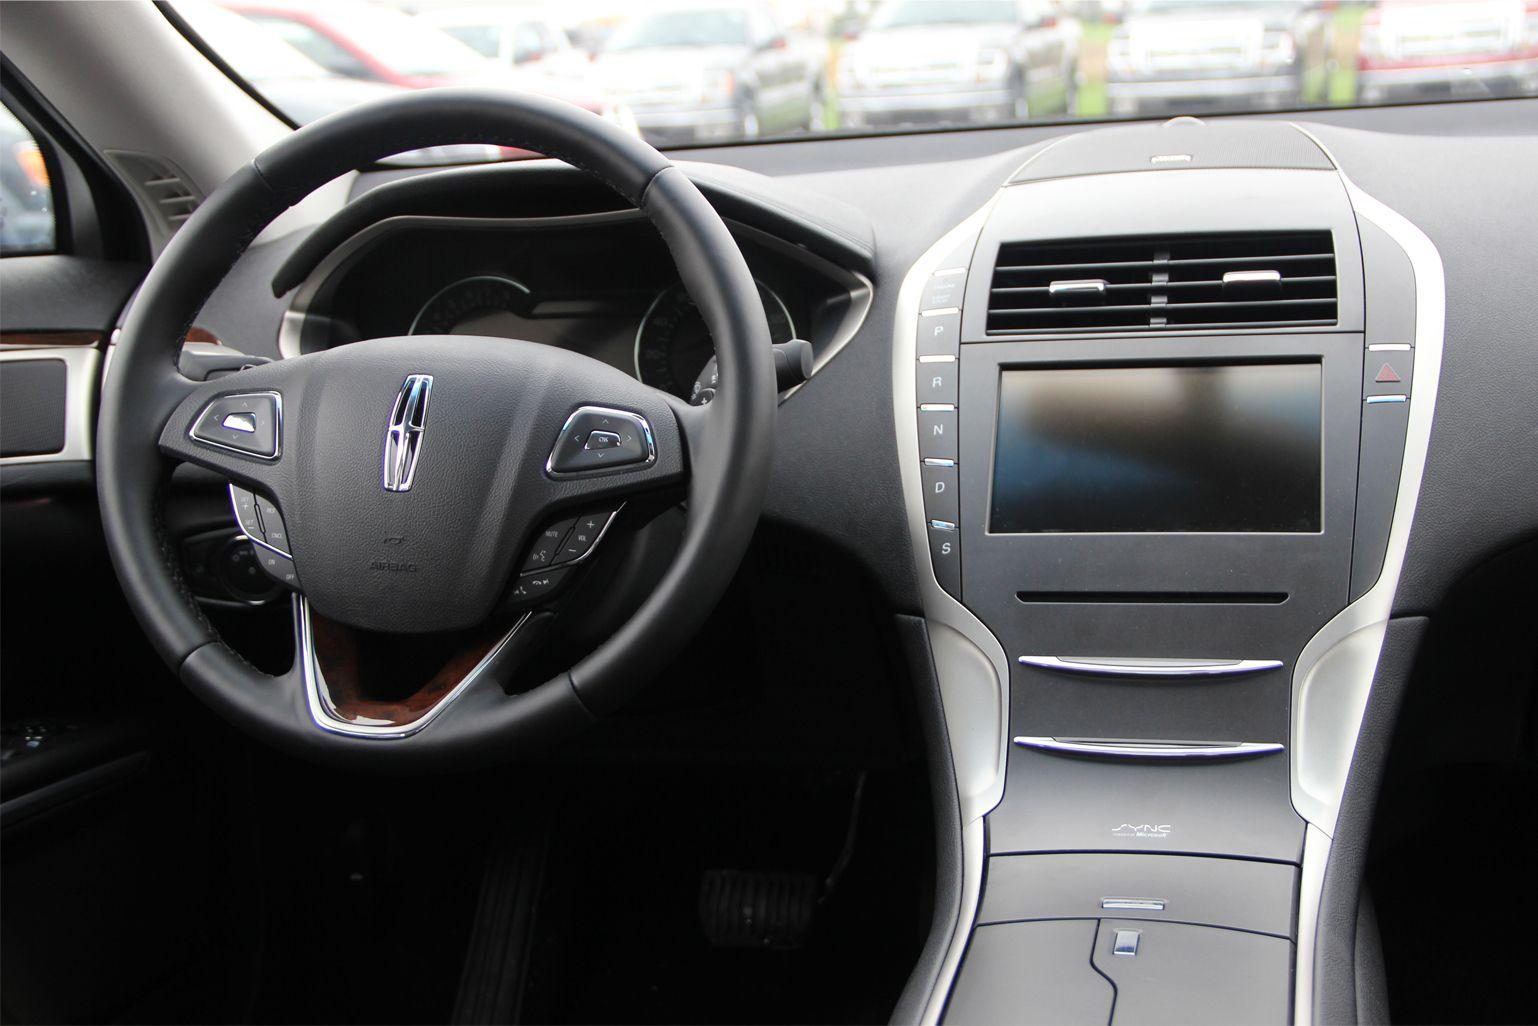 2015 Lincoln MKZ Ebony Interior